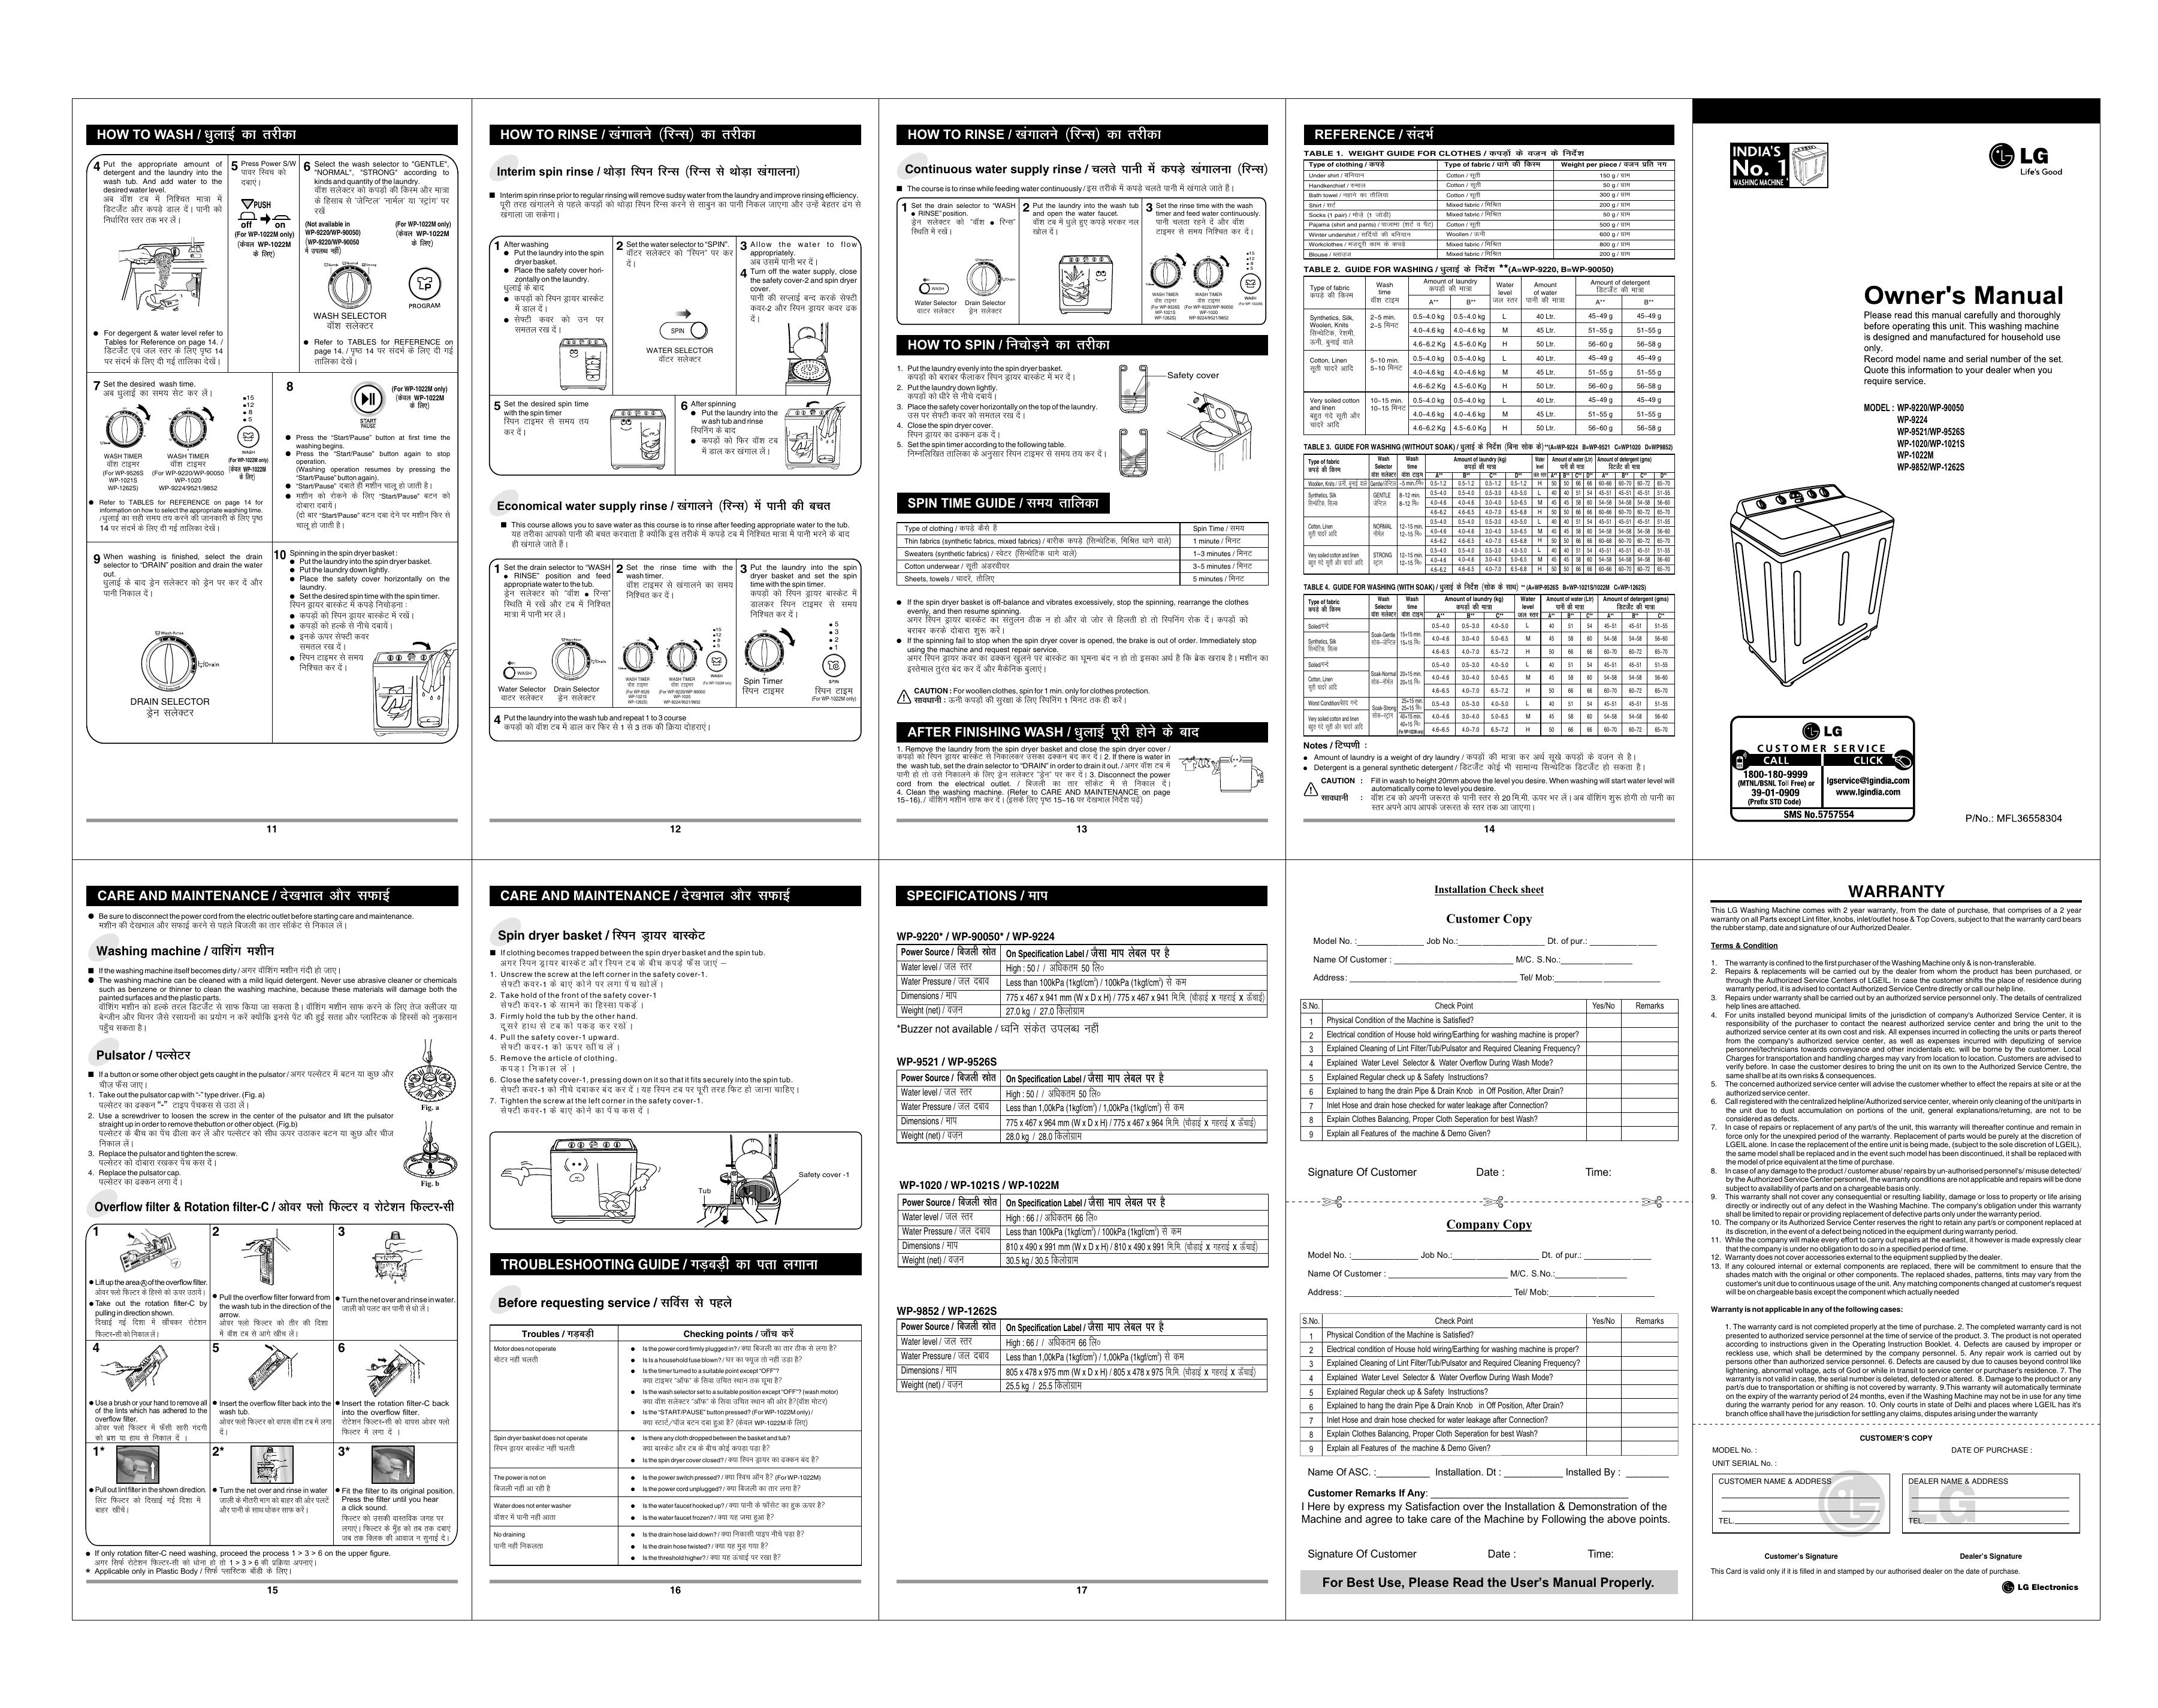 Lg Wp 1262s Owner S Manual Manualzz